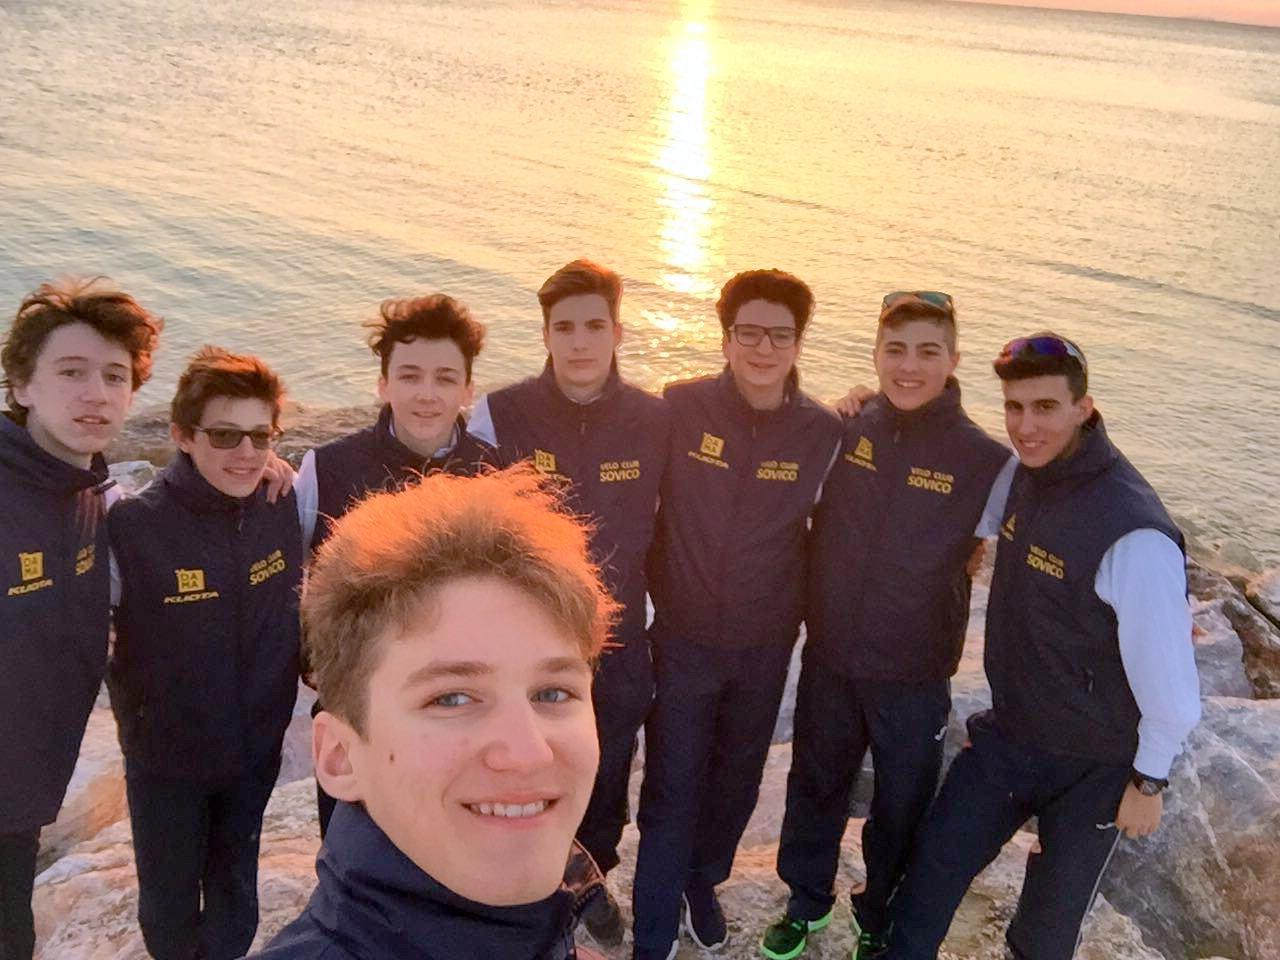 Selfie in spiaggia per i ragazzi del Velo Club Sovico